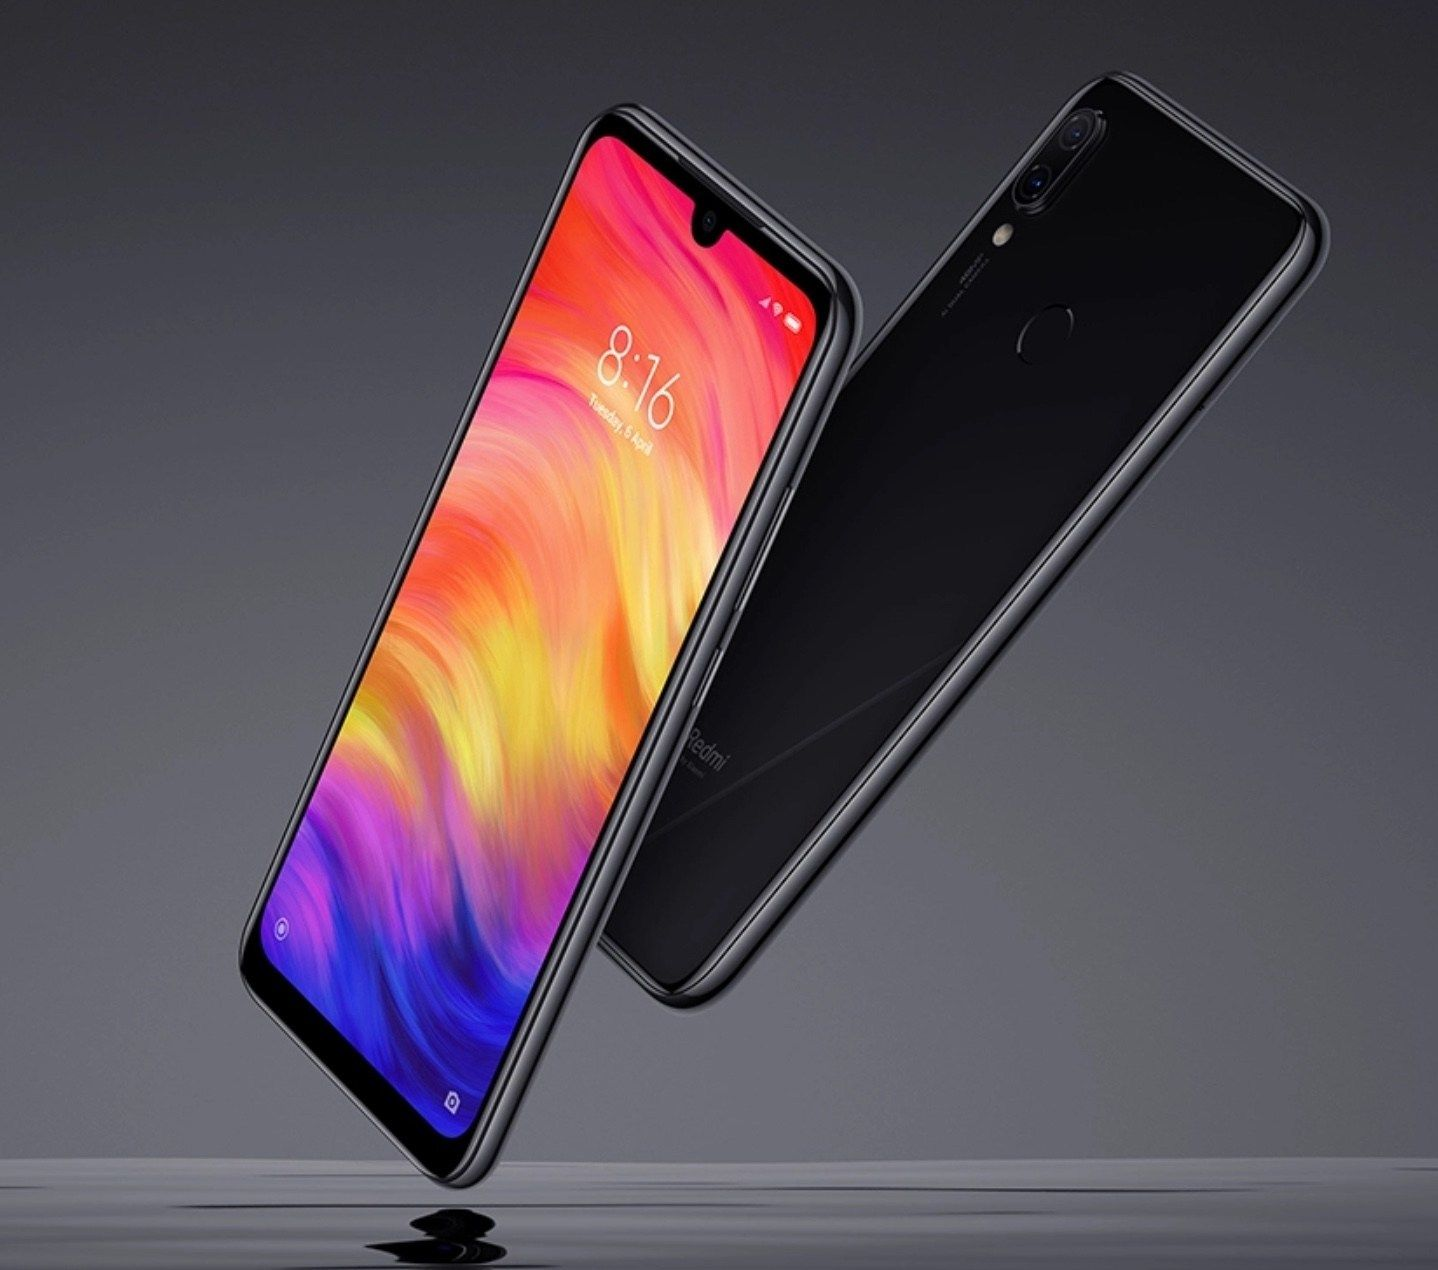 Redmi Note 7 Pro Specs And Review Impressive Camera Spotecno In 2021 Note 7 Xiaomi Ram Card